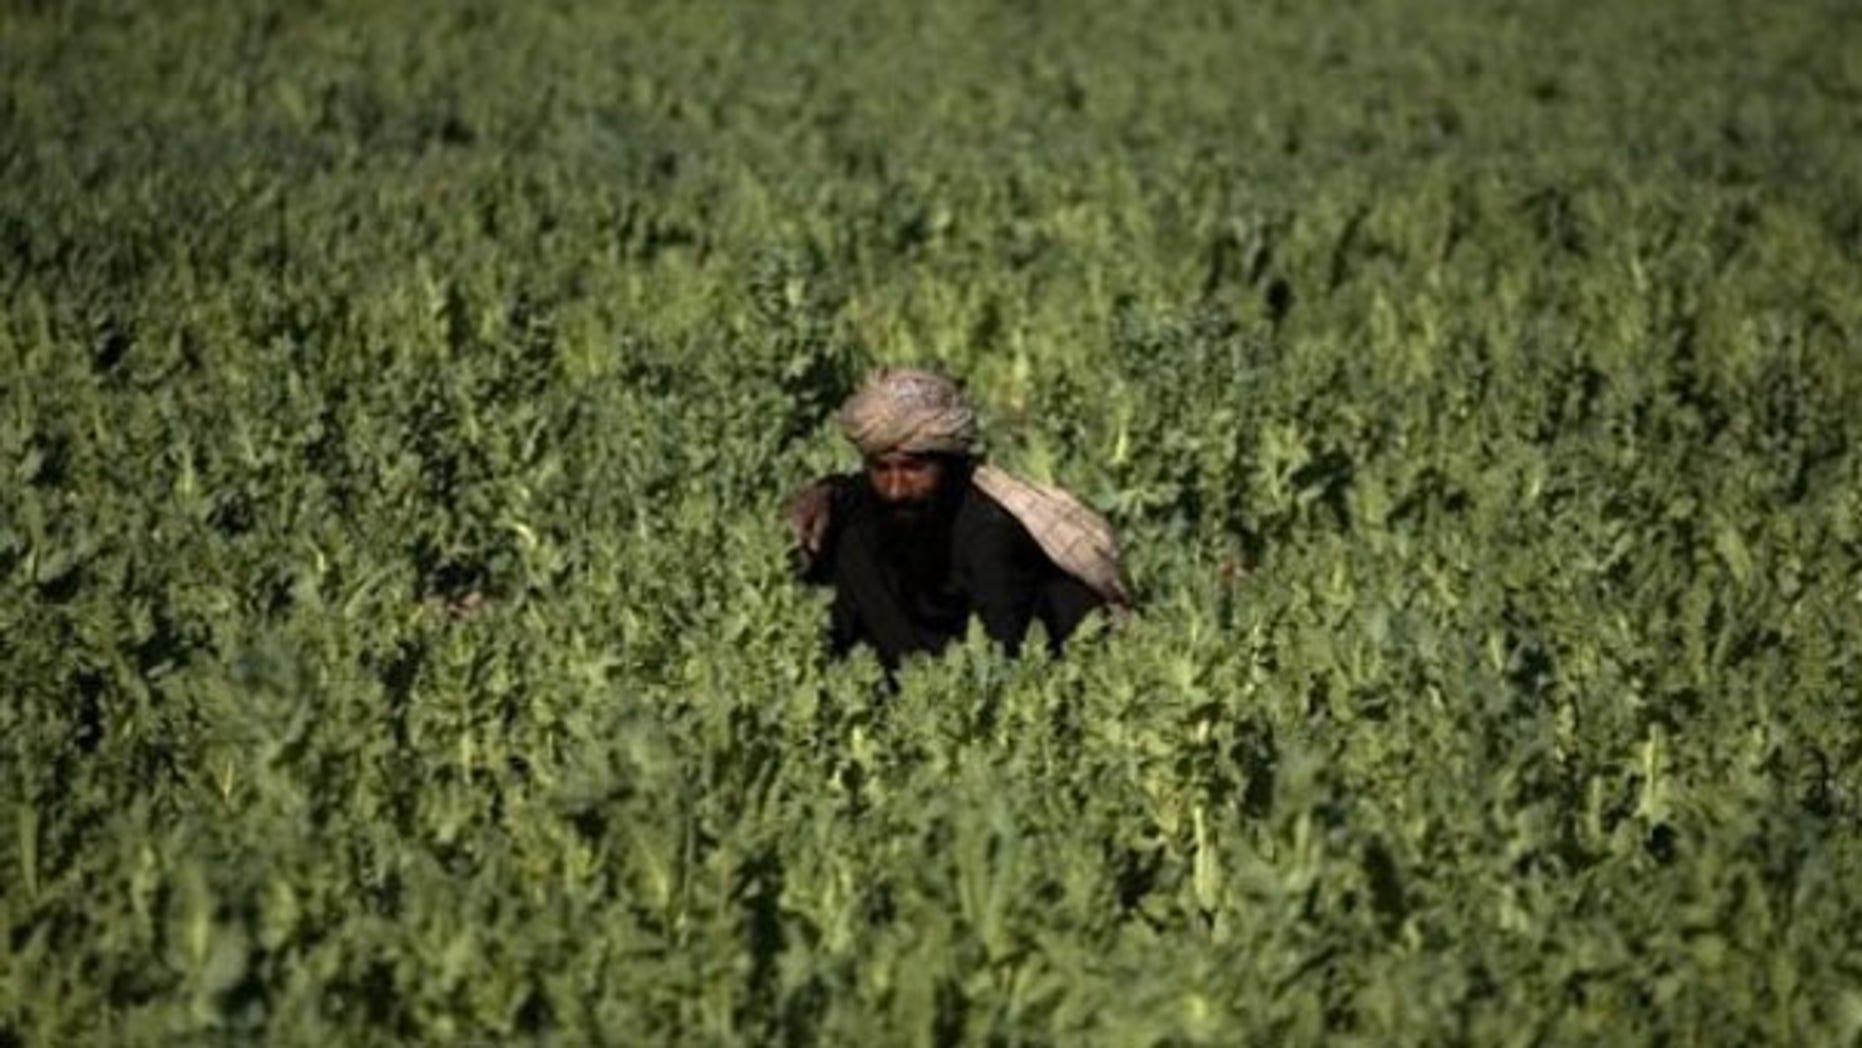 In this photo taken March 19, a farmer works in a poppy field in Marjah, Afghanistan. (AP Photo)